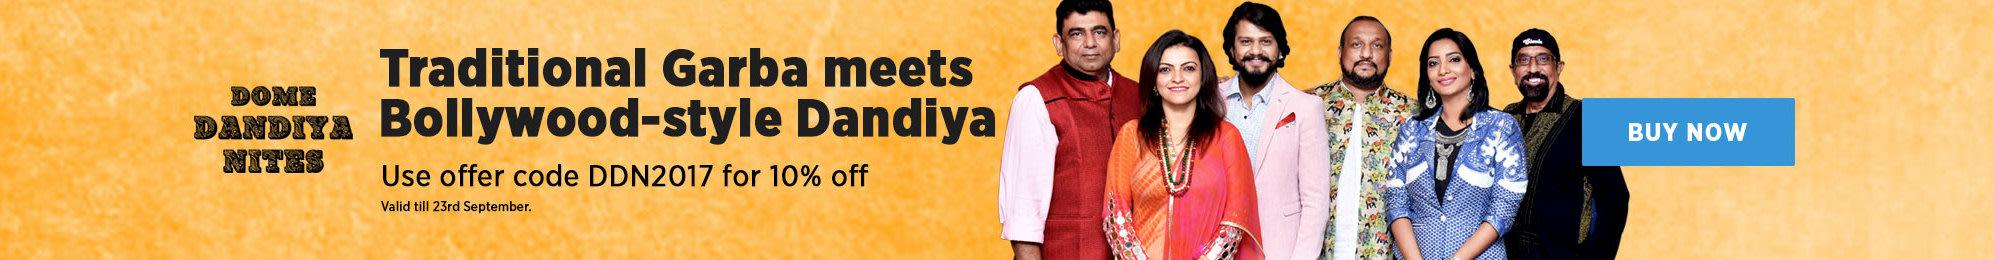 Traditional Garba meets Bollywood style Dandiya!